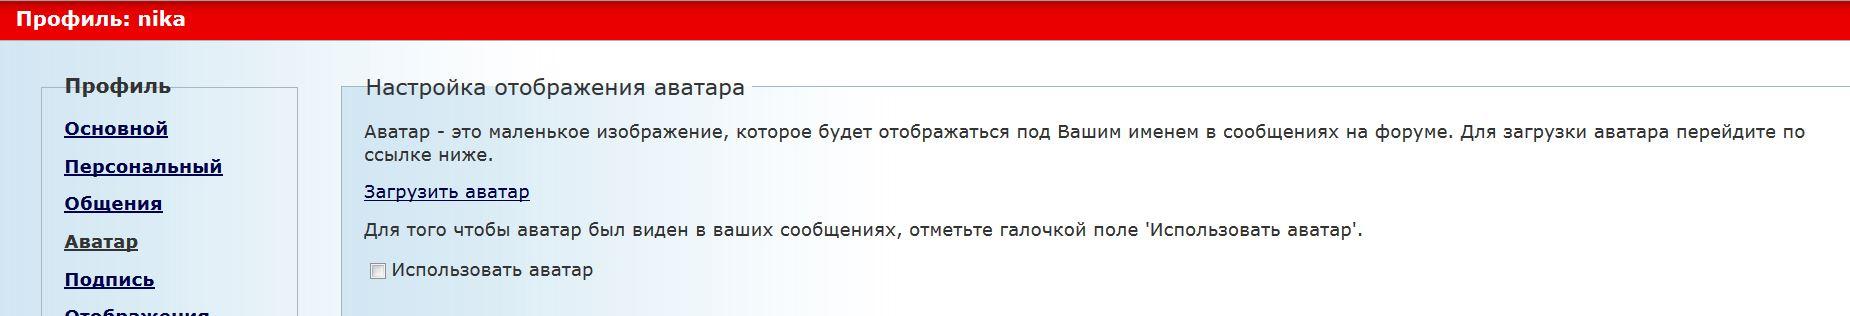 http://sa.uploads.ru/2HfTd.jpg